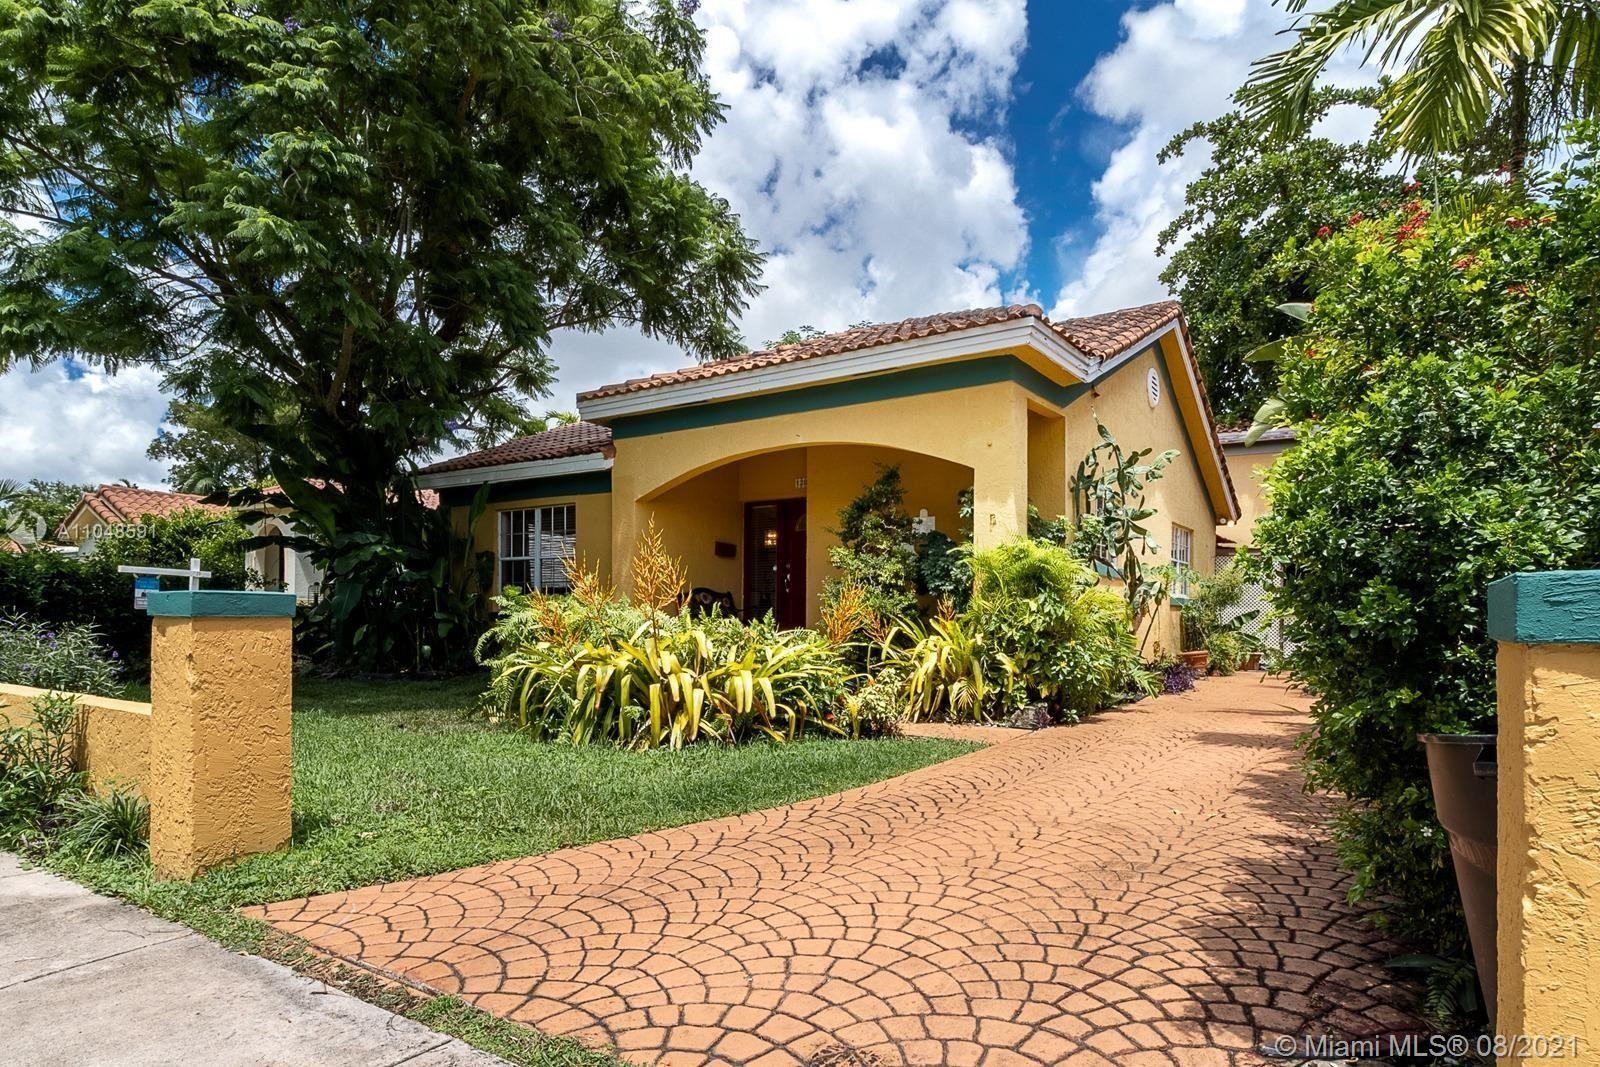 1205 Wallace St, Coral Gables, FL 33134 - #: A11048591